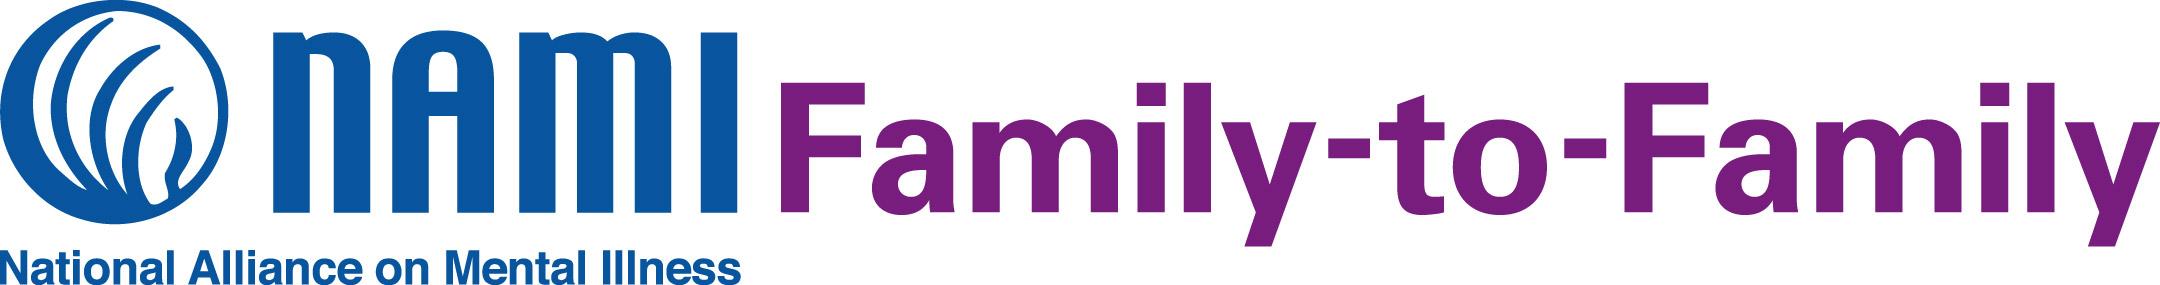 Image result for nami family-to-family logo